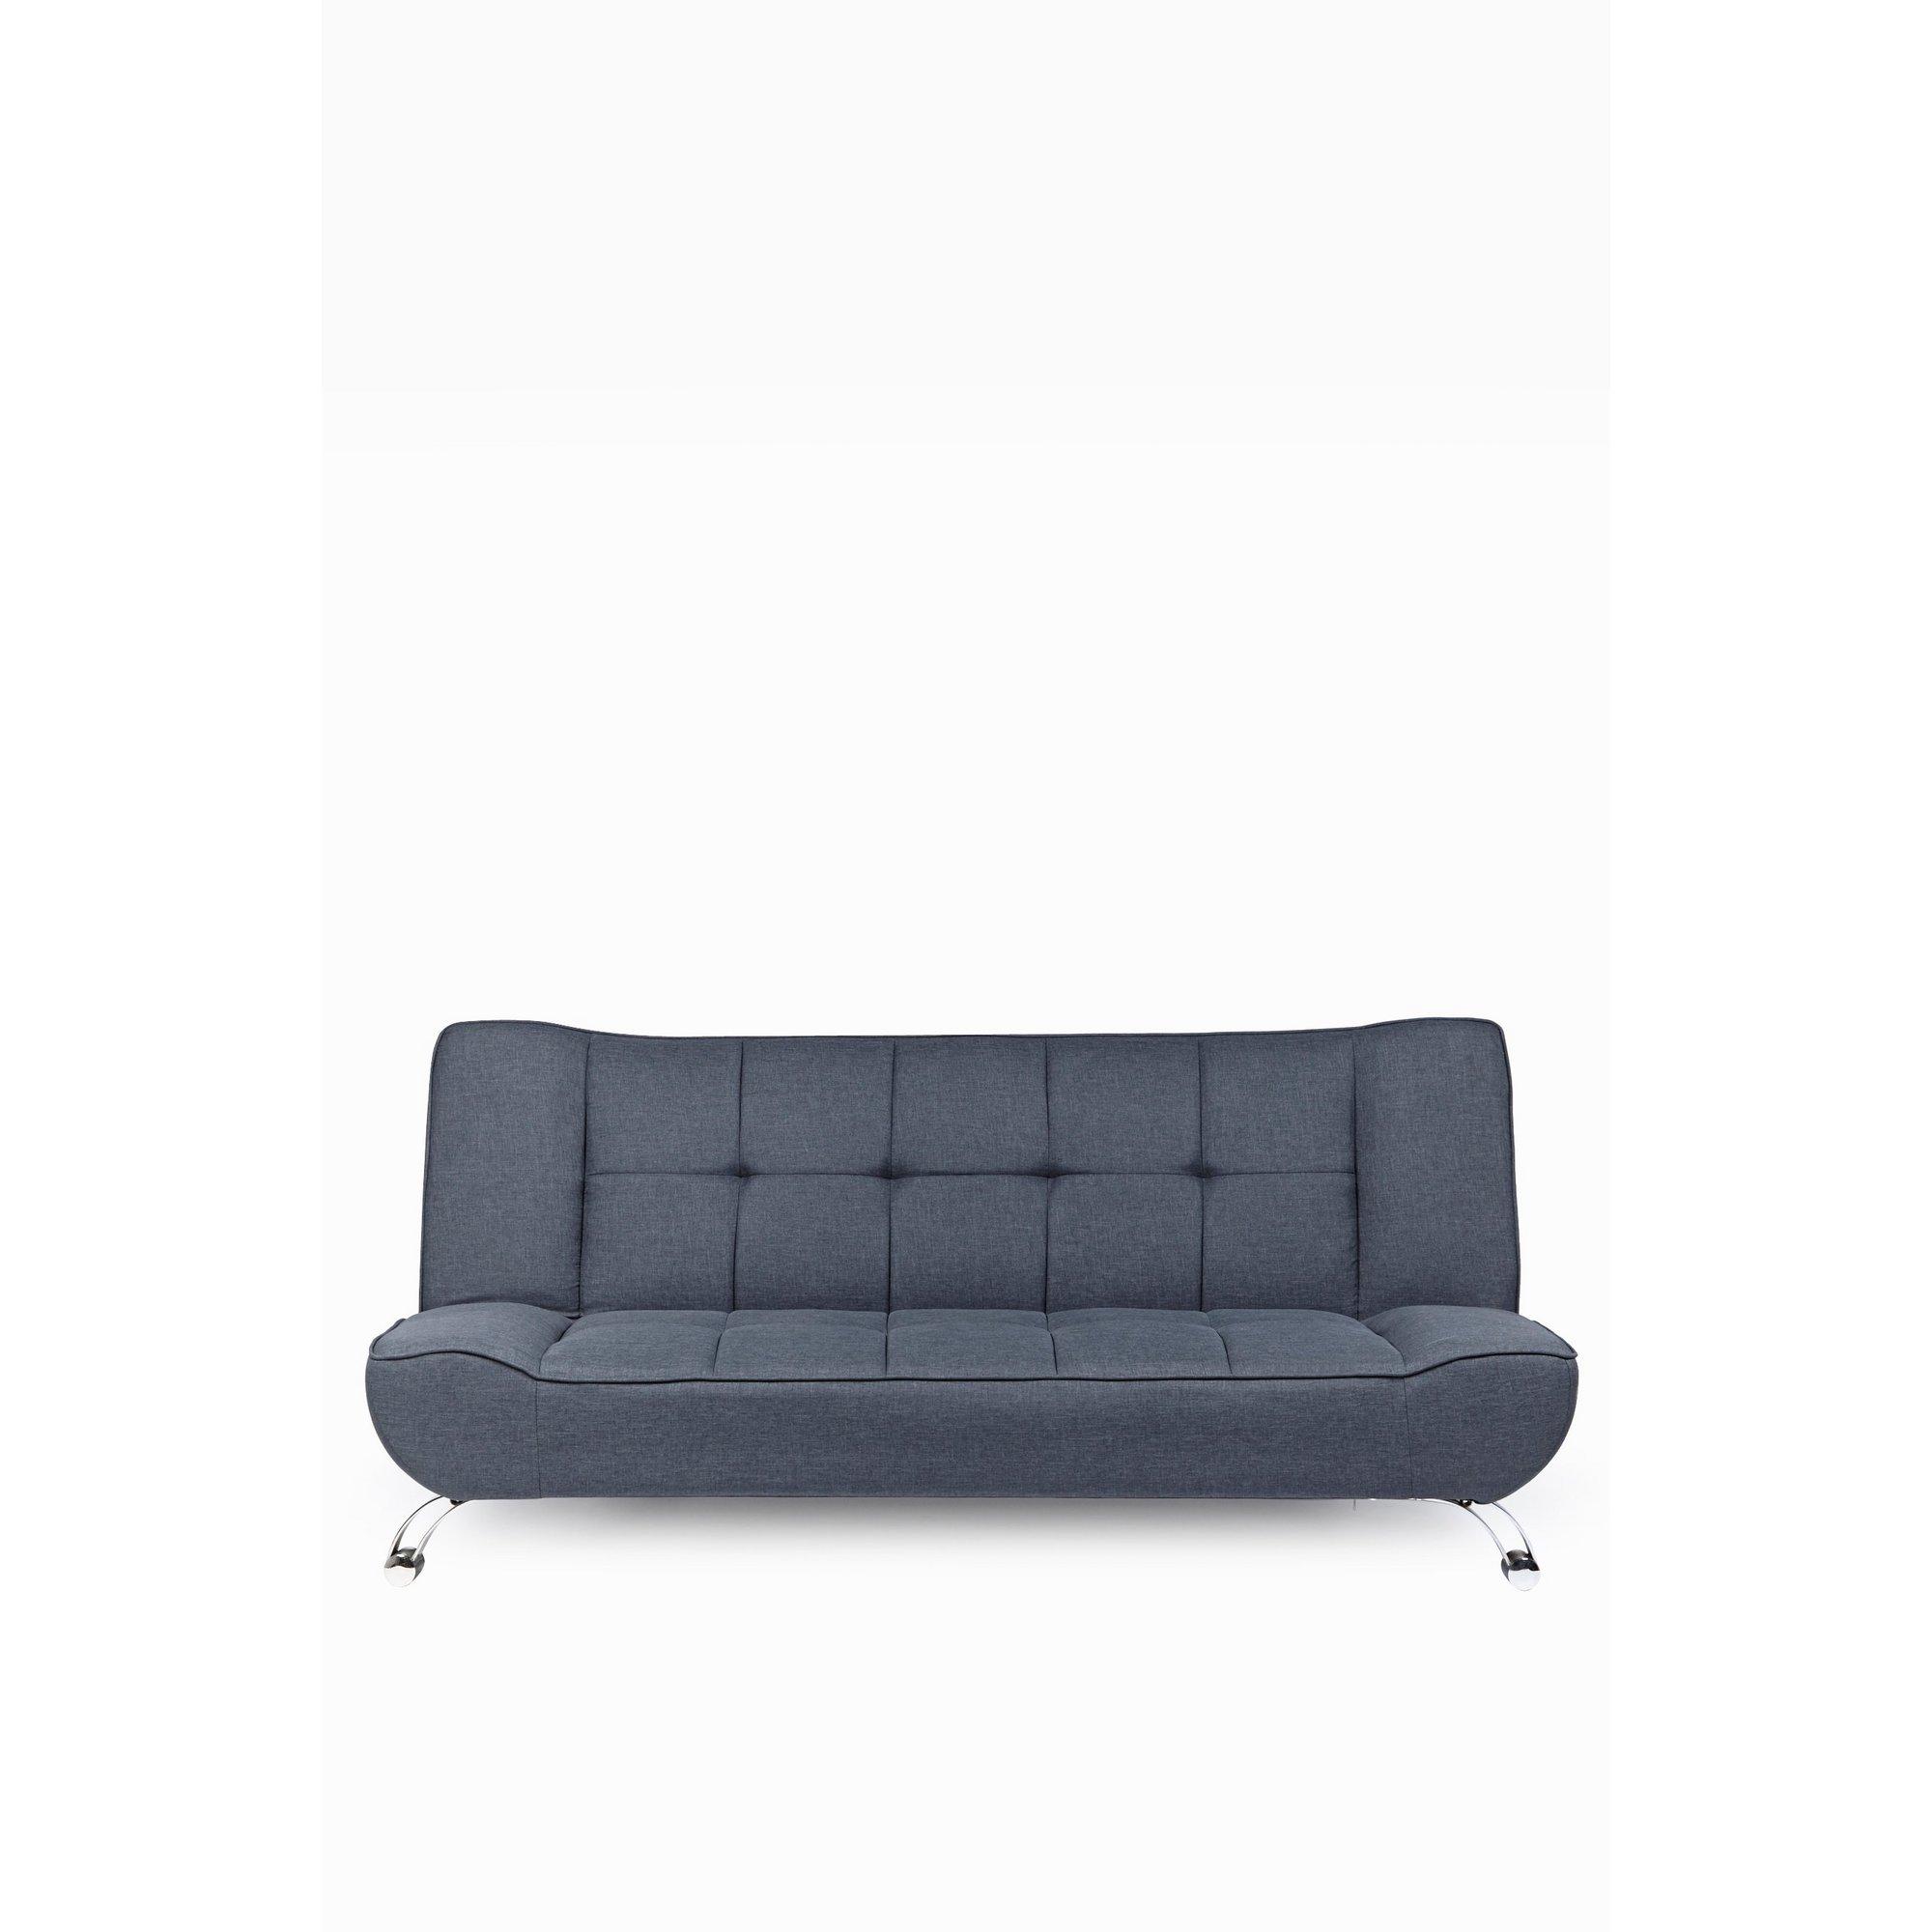 Image of Genoa Fabric Sofa Bed